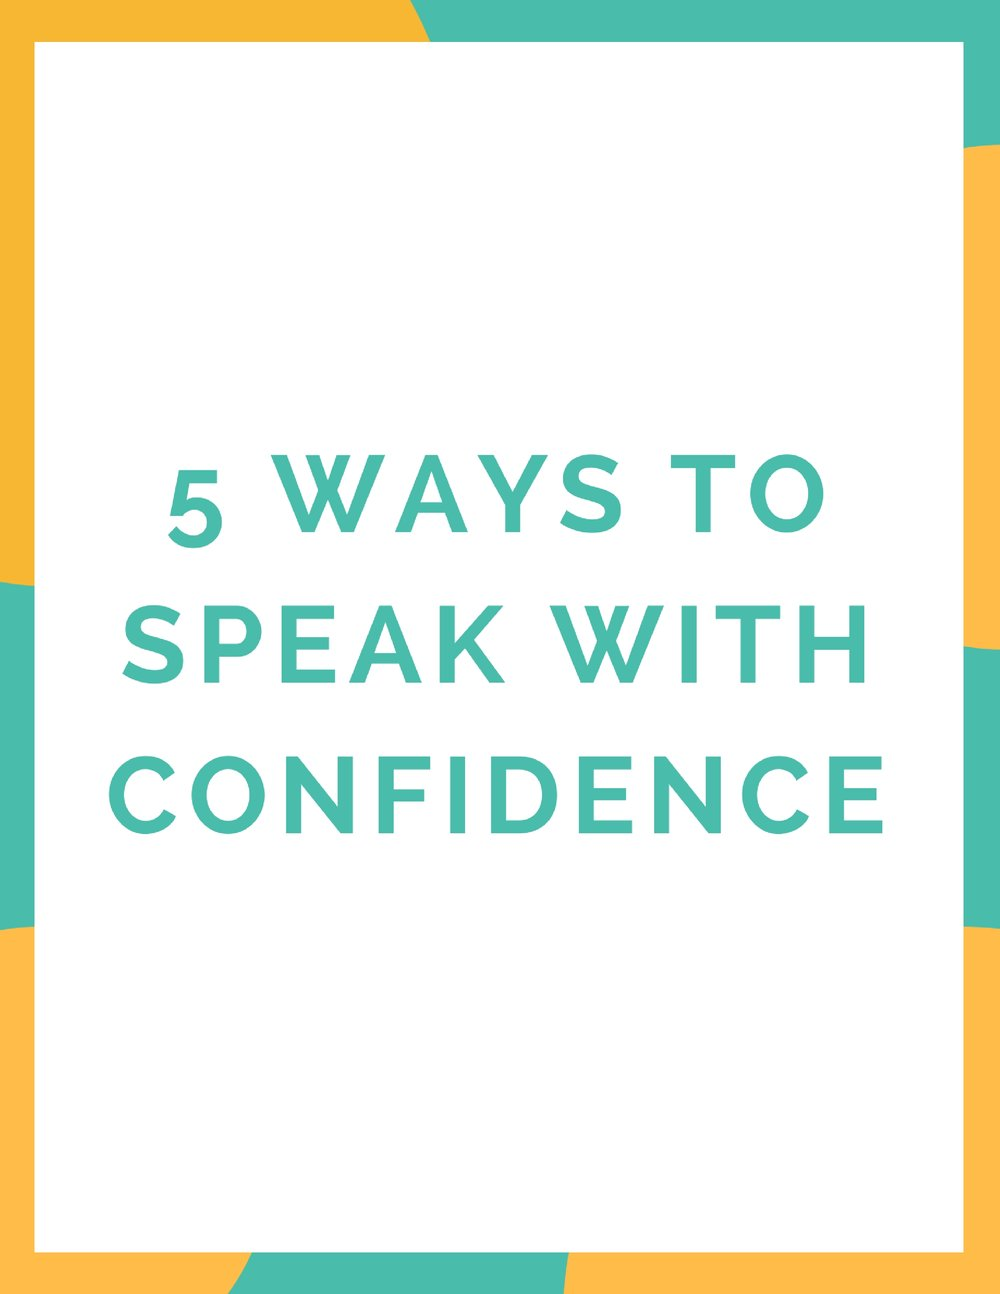 5 ways to Speak with Confidence-2.jpg